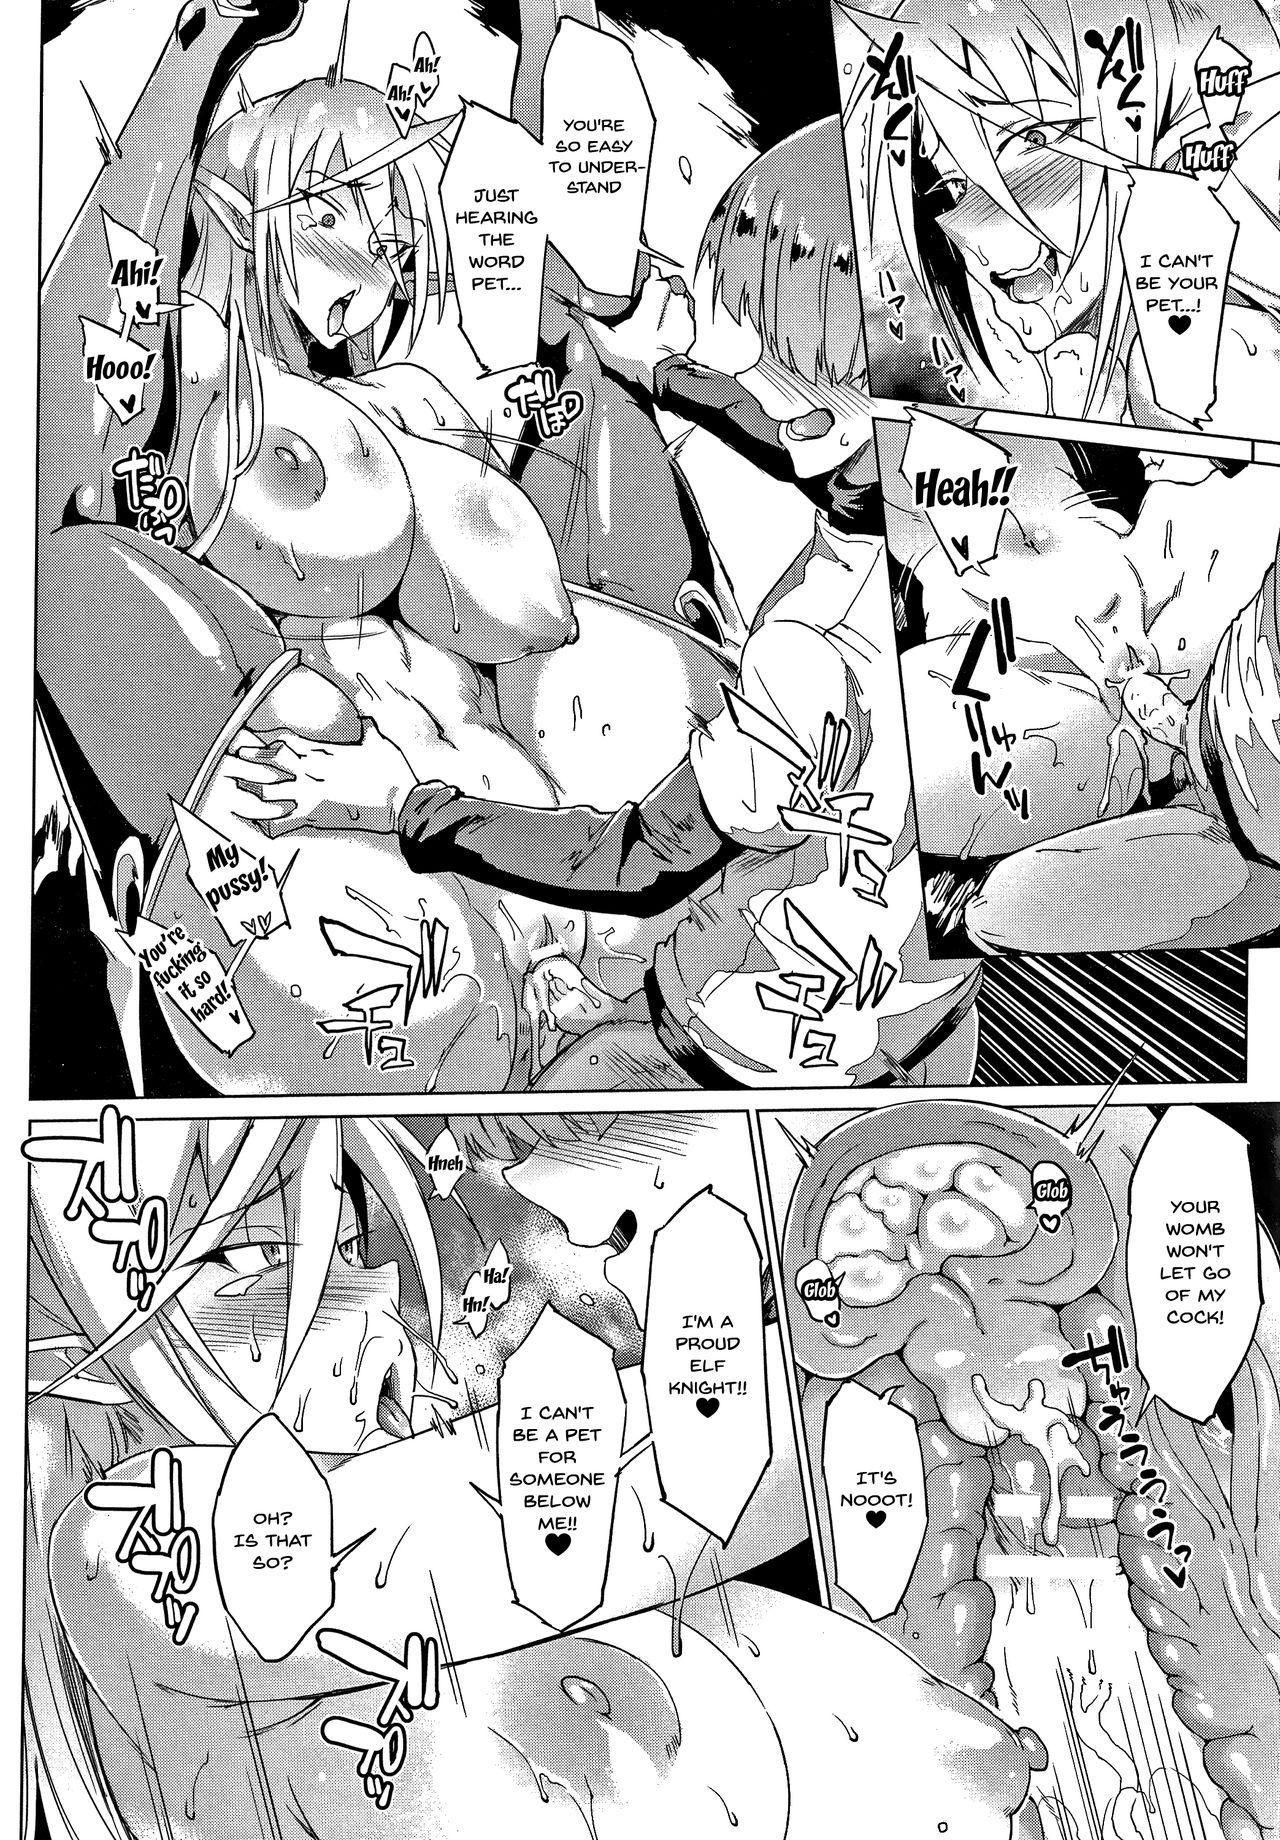 [Fan no Hitori] Sennen Reijou ~ My Lady, My Master ~  Ch.1-2 [English] {Doujins.com} 26